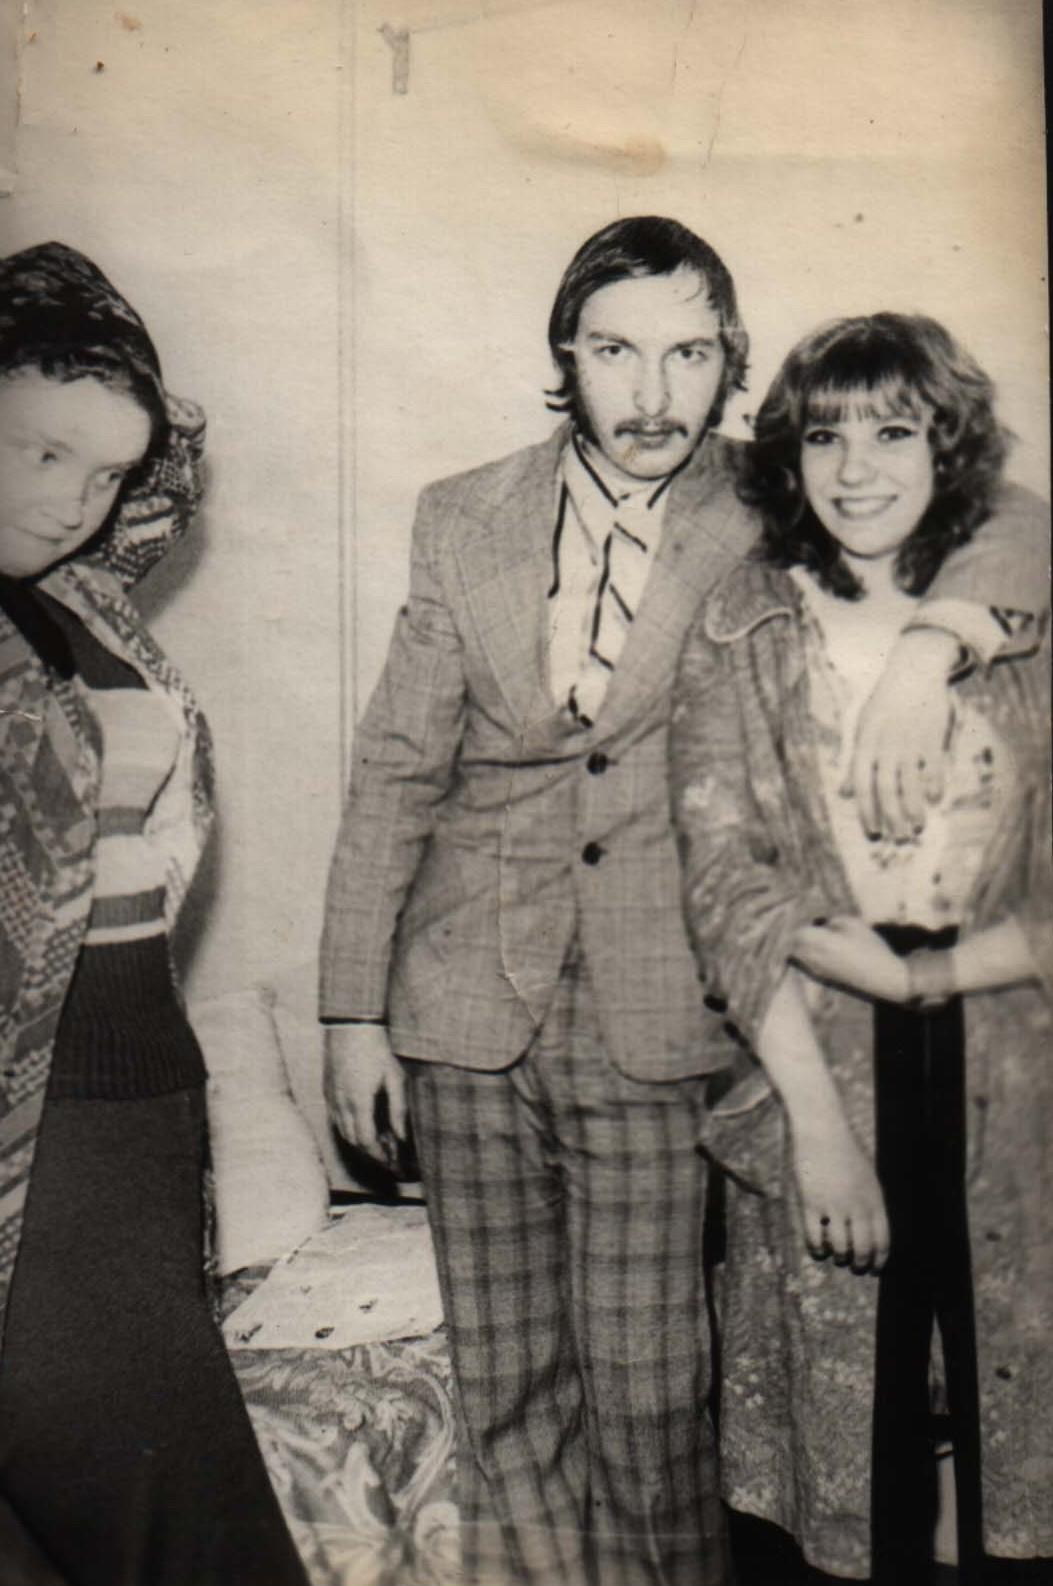 В центре — Лысенко Георгий Павлович, справа — Лысенко (?) Валентина, его жена